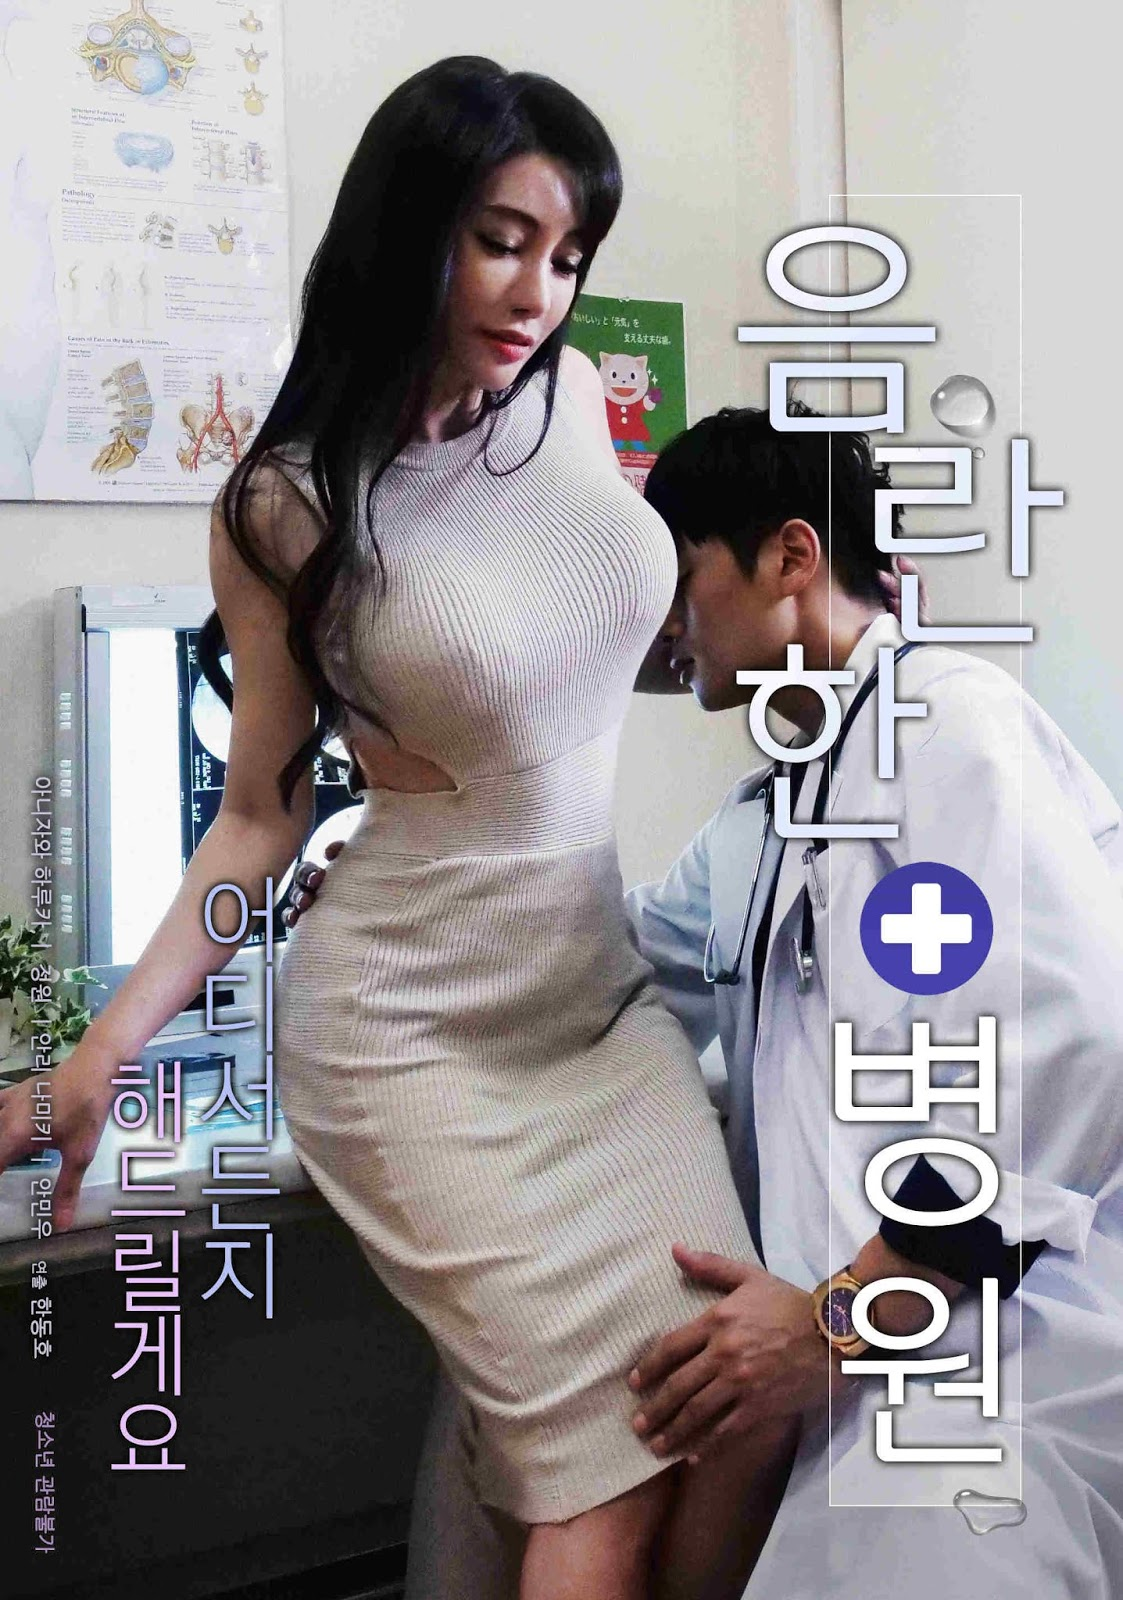 Risque Hospital Full Korea 18+ Adult Movie Online Free